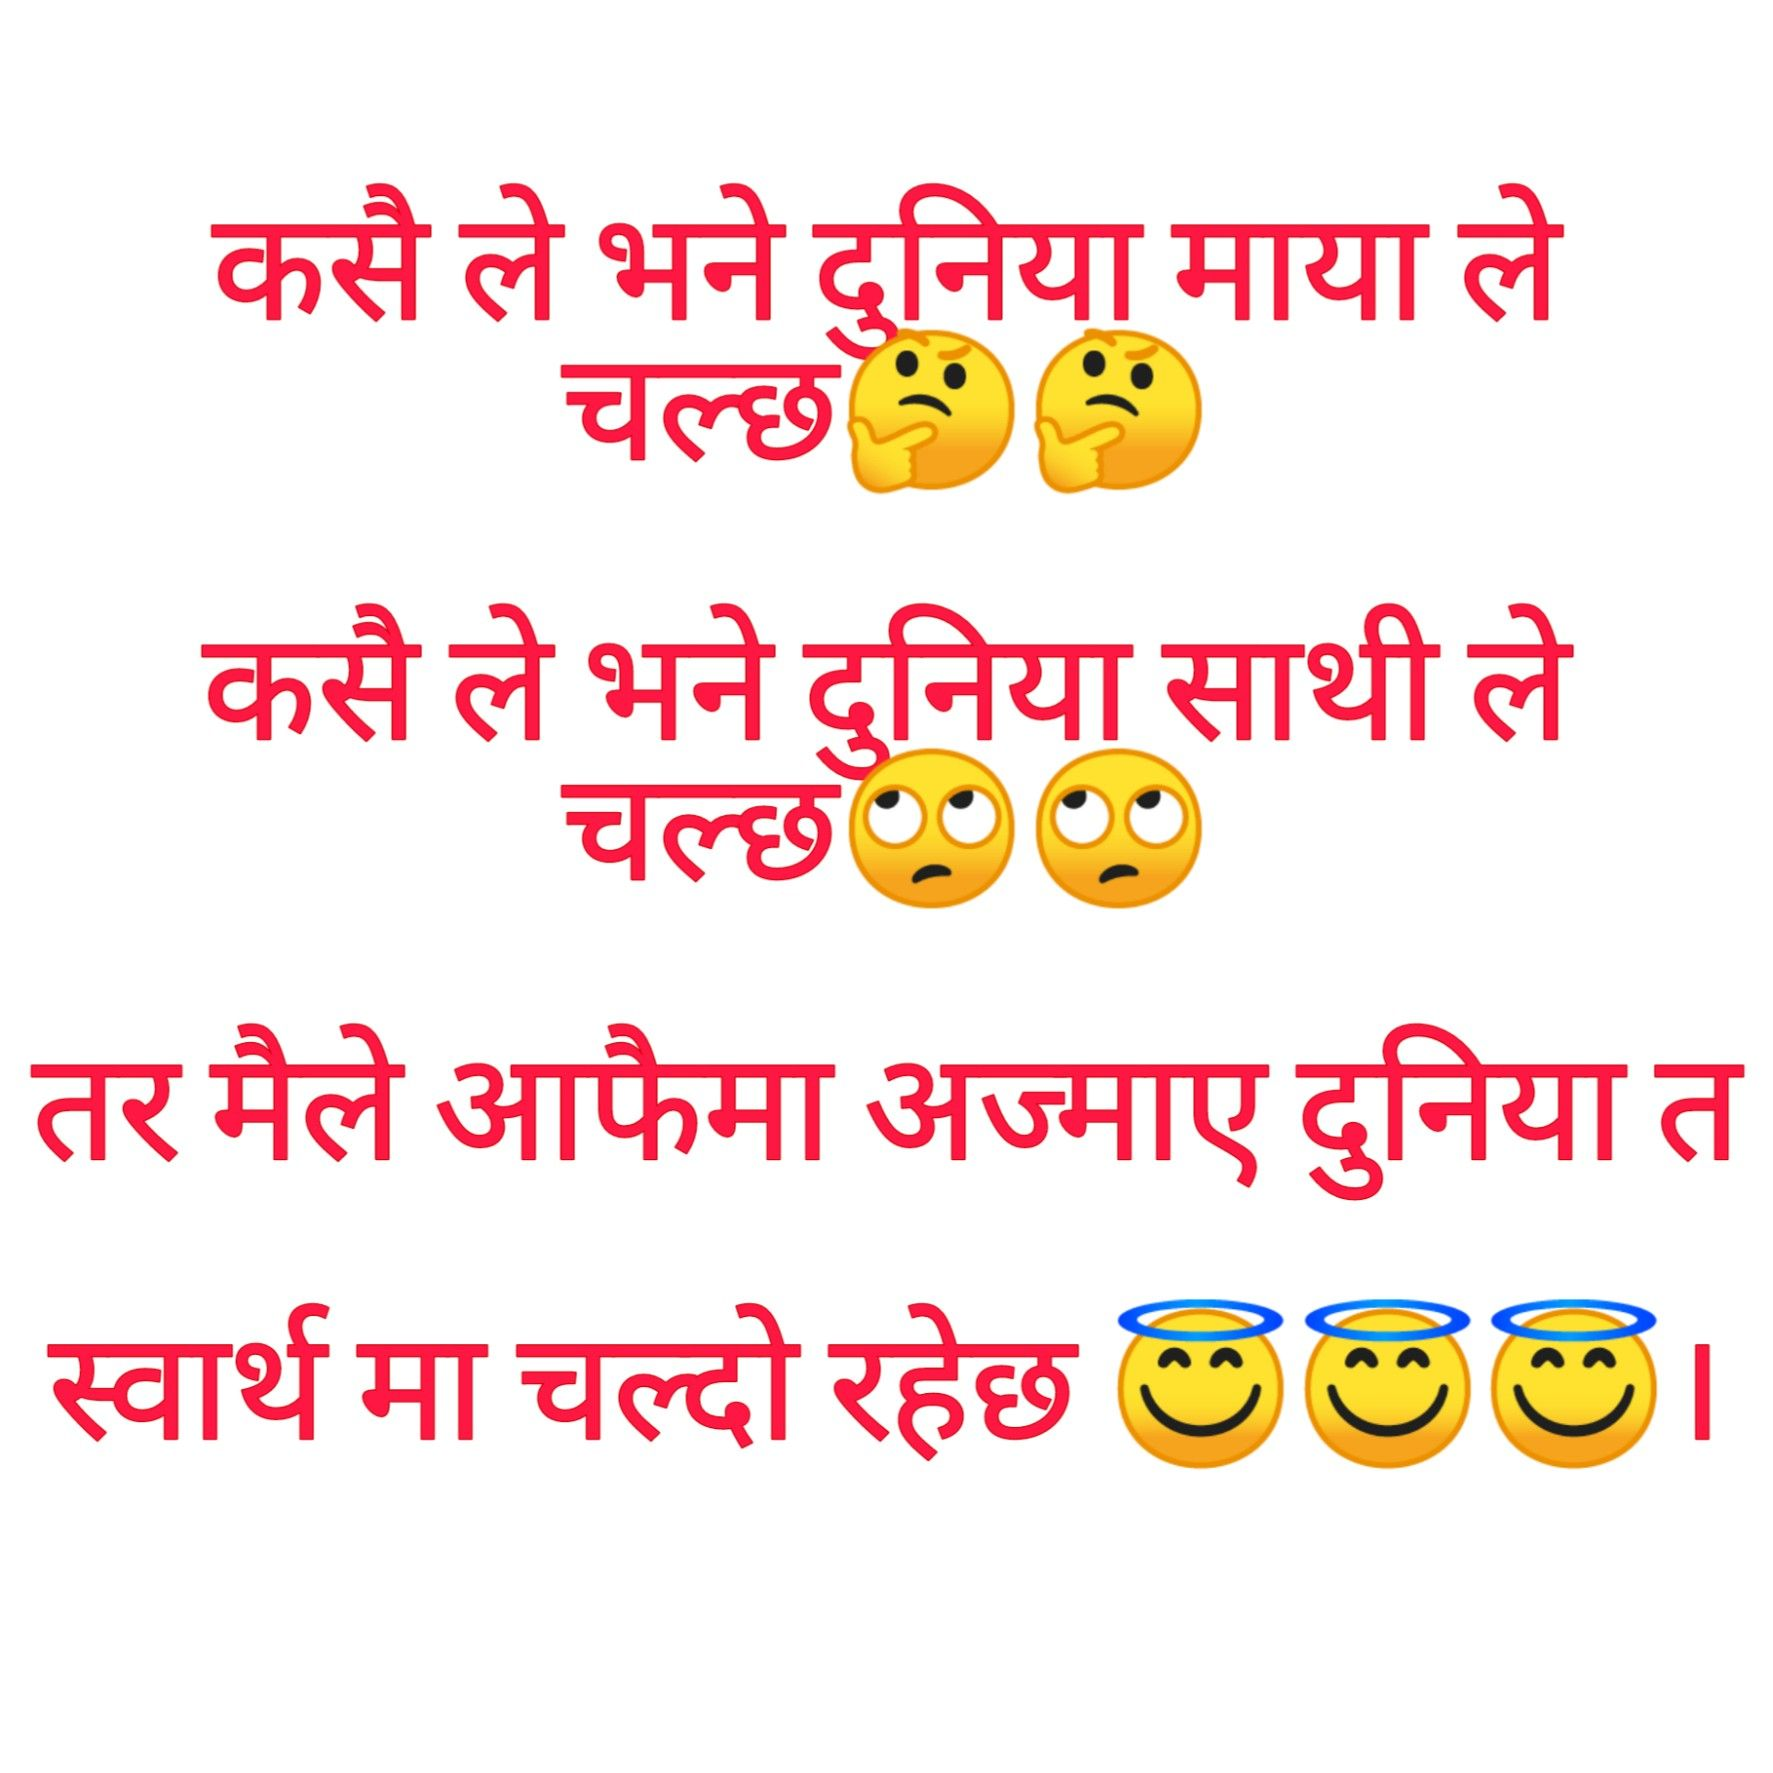 Ishorstatus Blogspot Com Nepali Love Quotes Happy Birthday Quotes For Friends Life Quotes